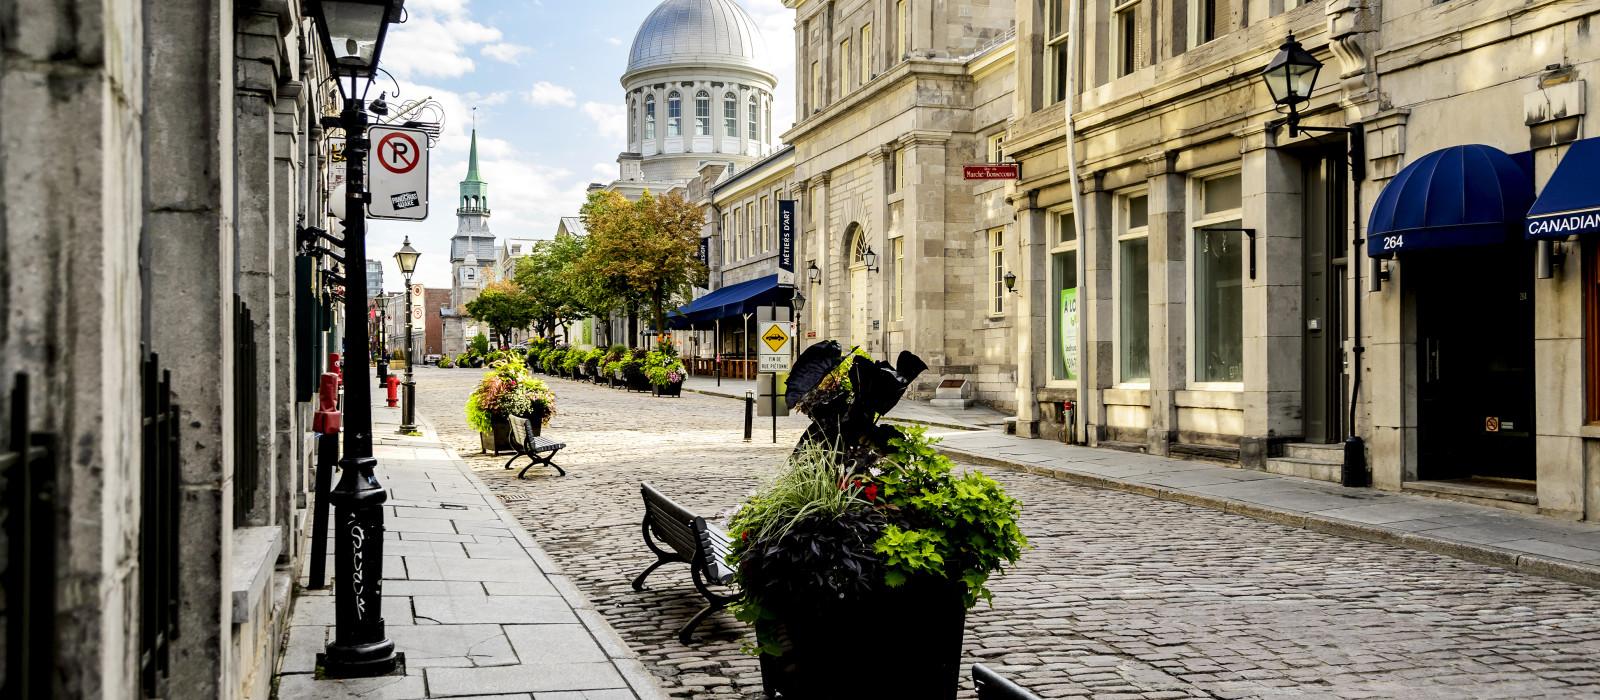 Destination Montreal Canada